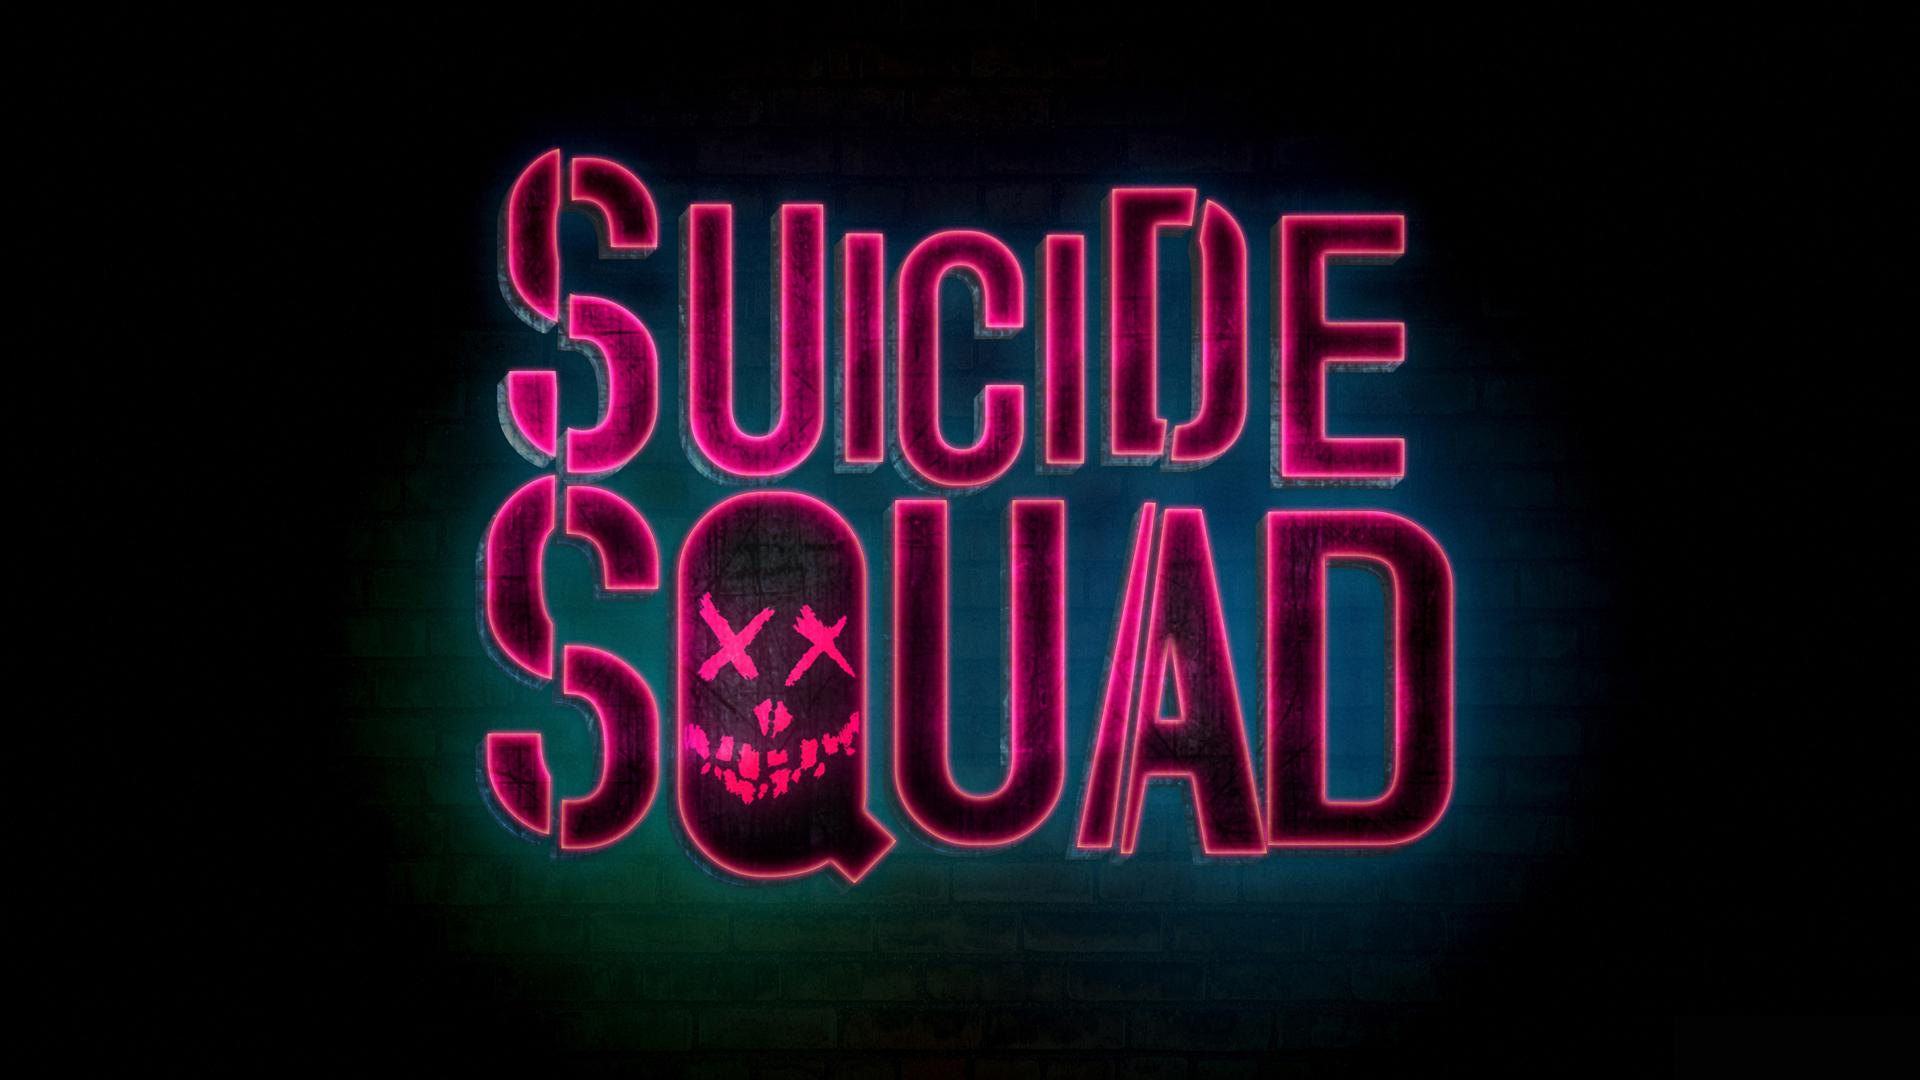 fondos escuadr n suicida wallpapers suicide squad pelicula. Black Bedroom Furniture Sets. Home Design Ideas